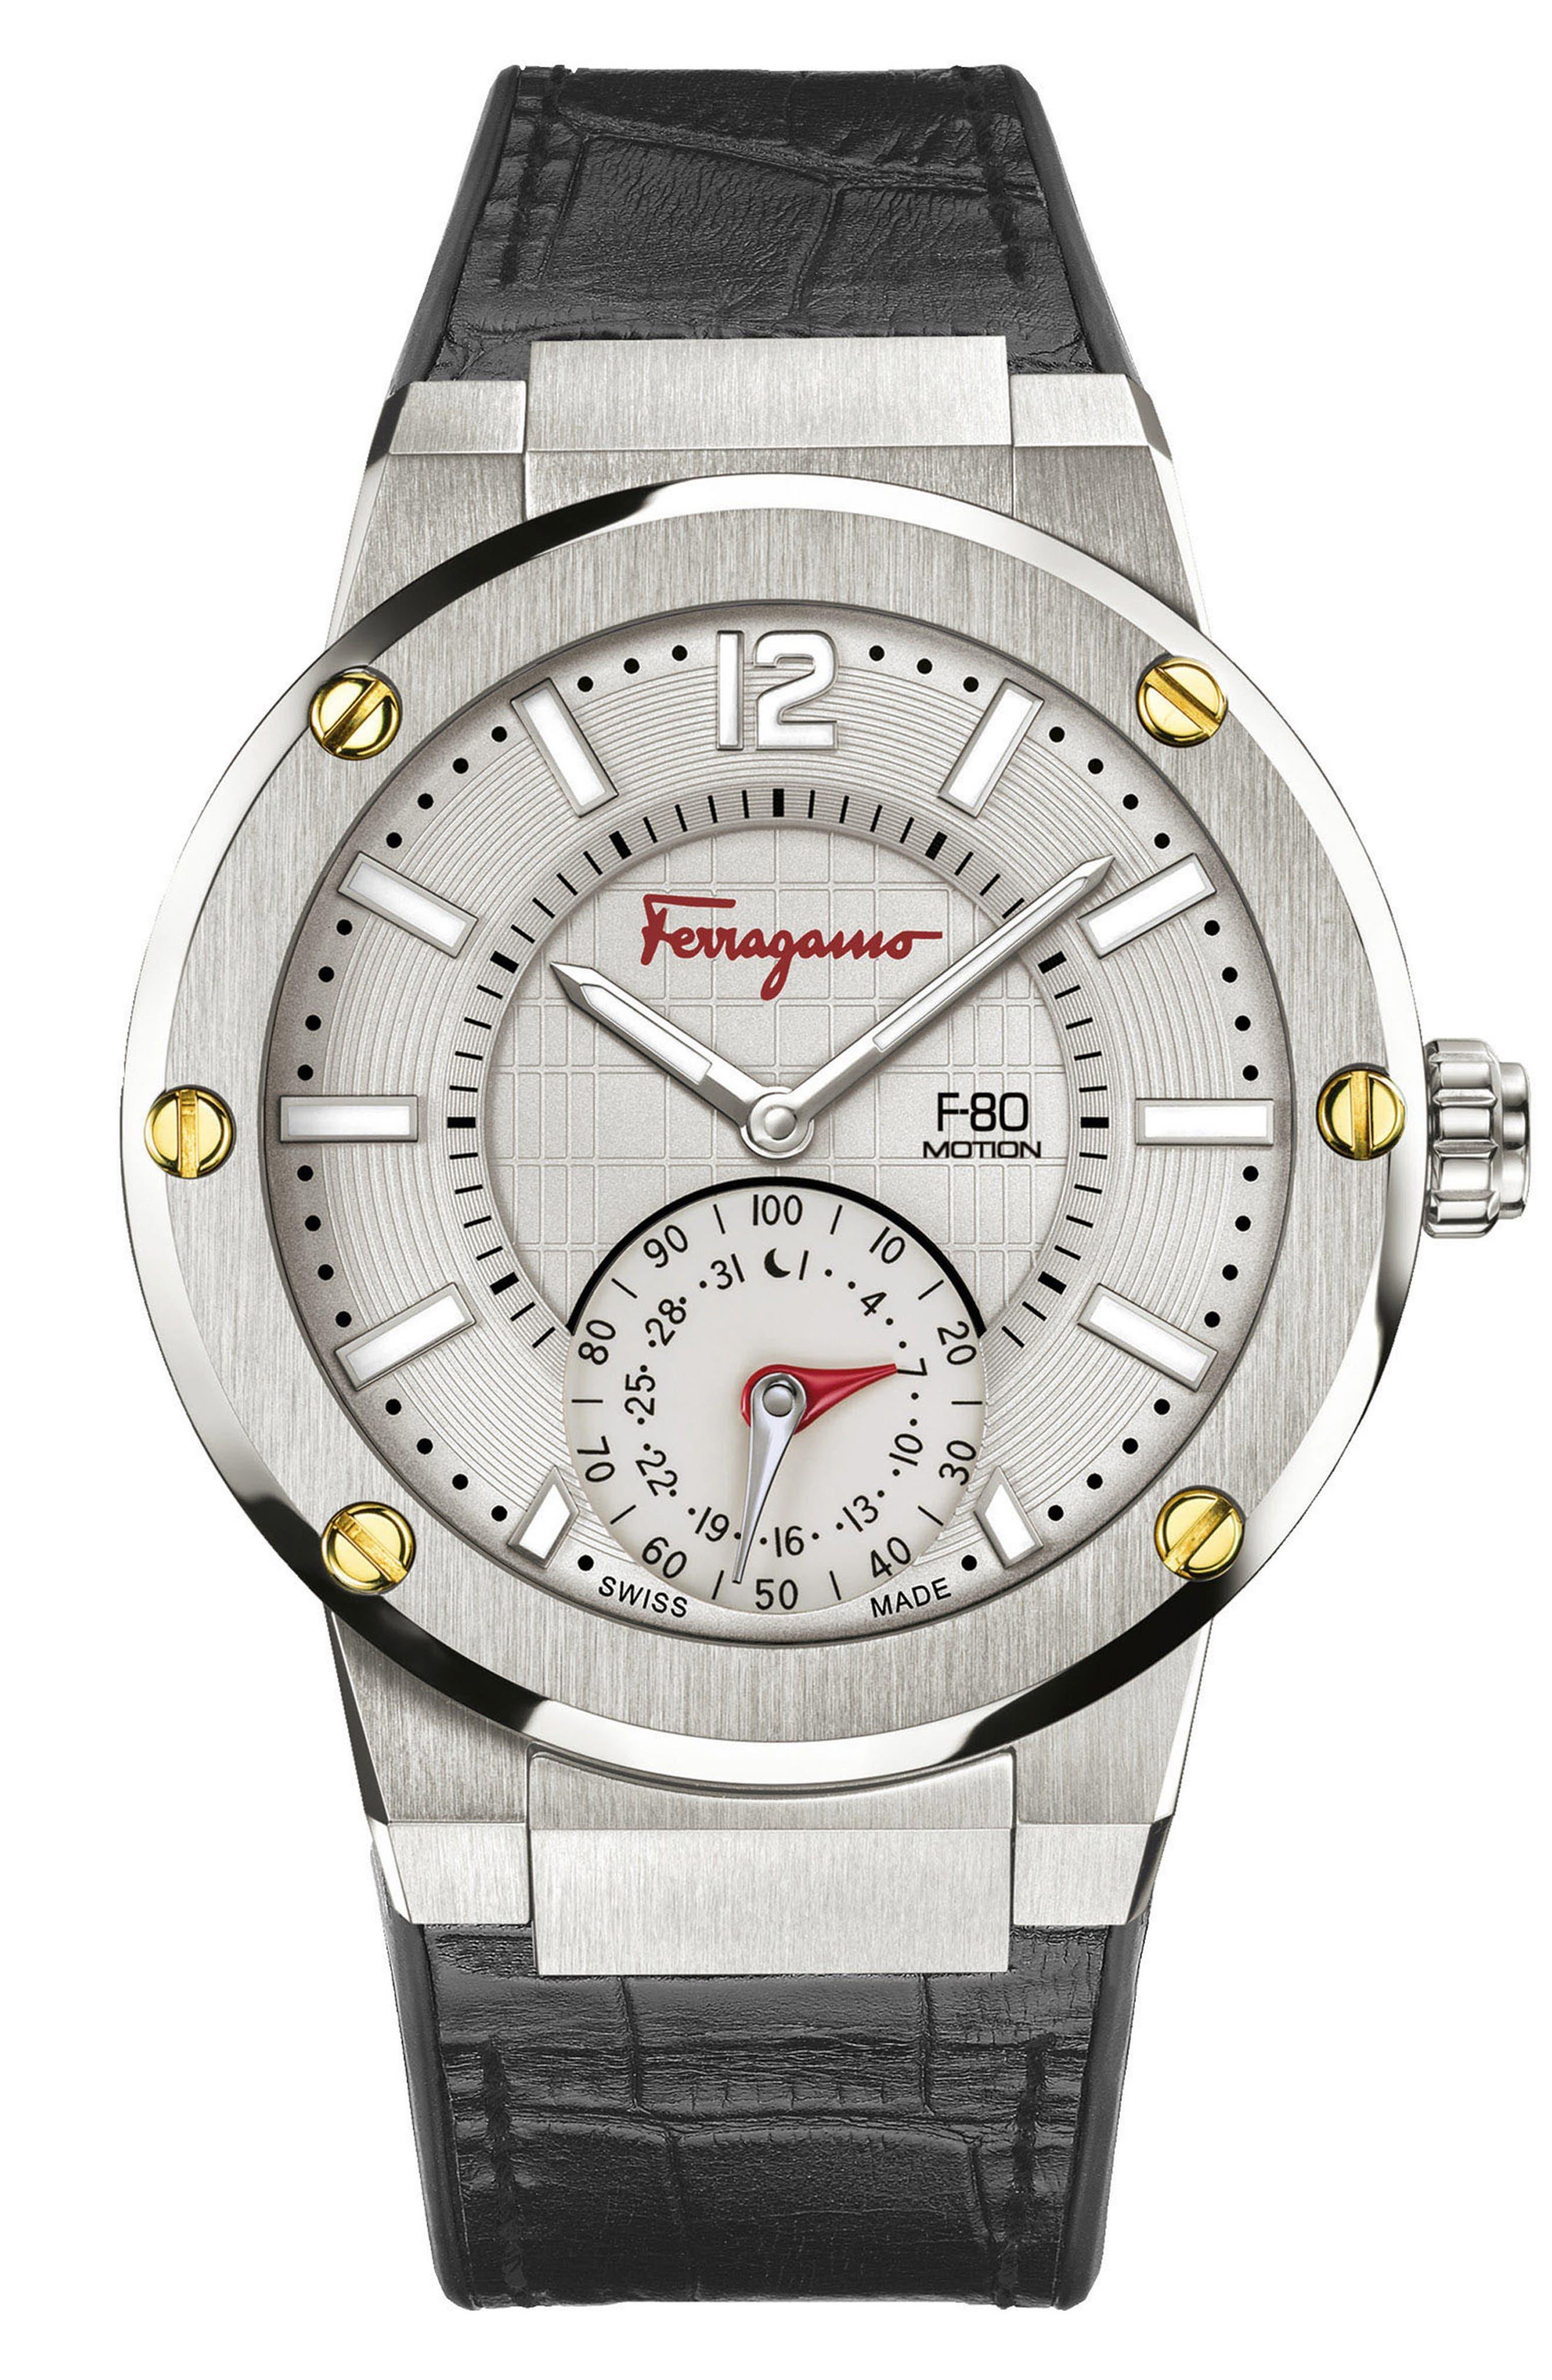 SALVATORE FERRAGAMO 'F-80 Motion' Leather Strap Smart Watch, 44mm, Main, color, BLACK/ GREY/ SILVER